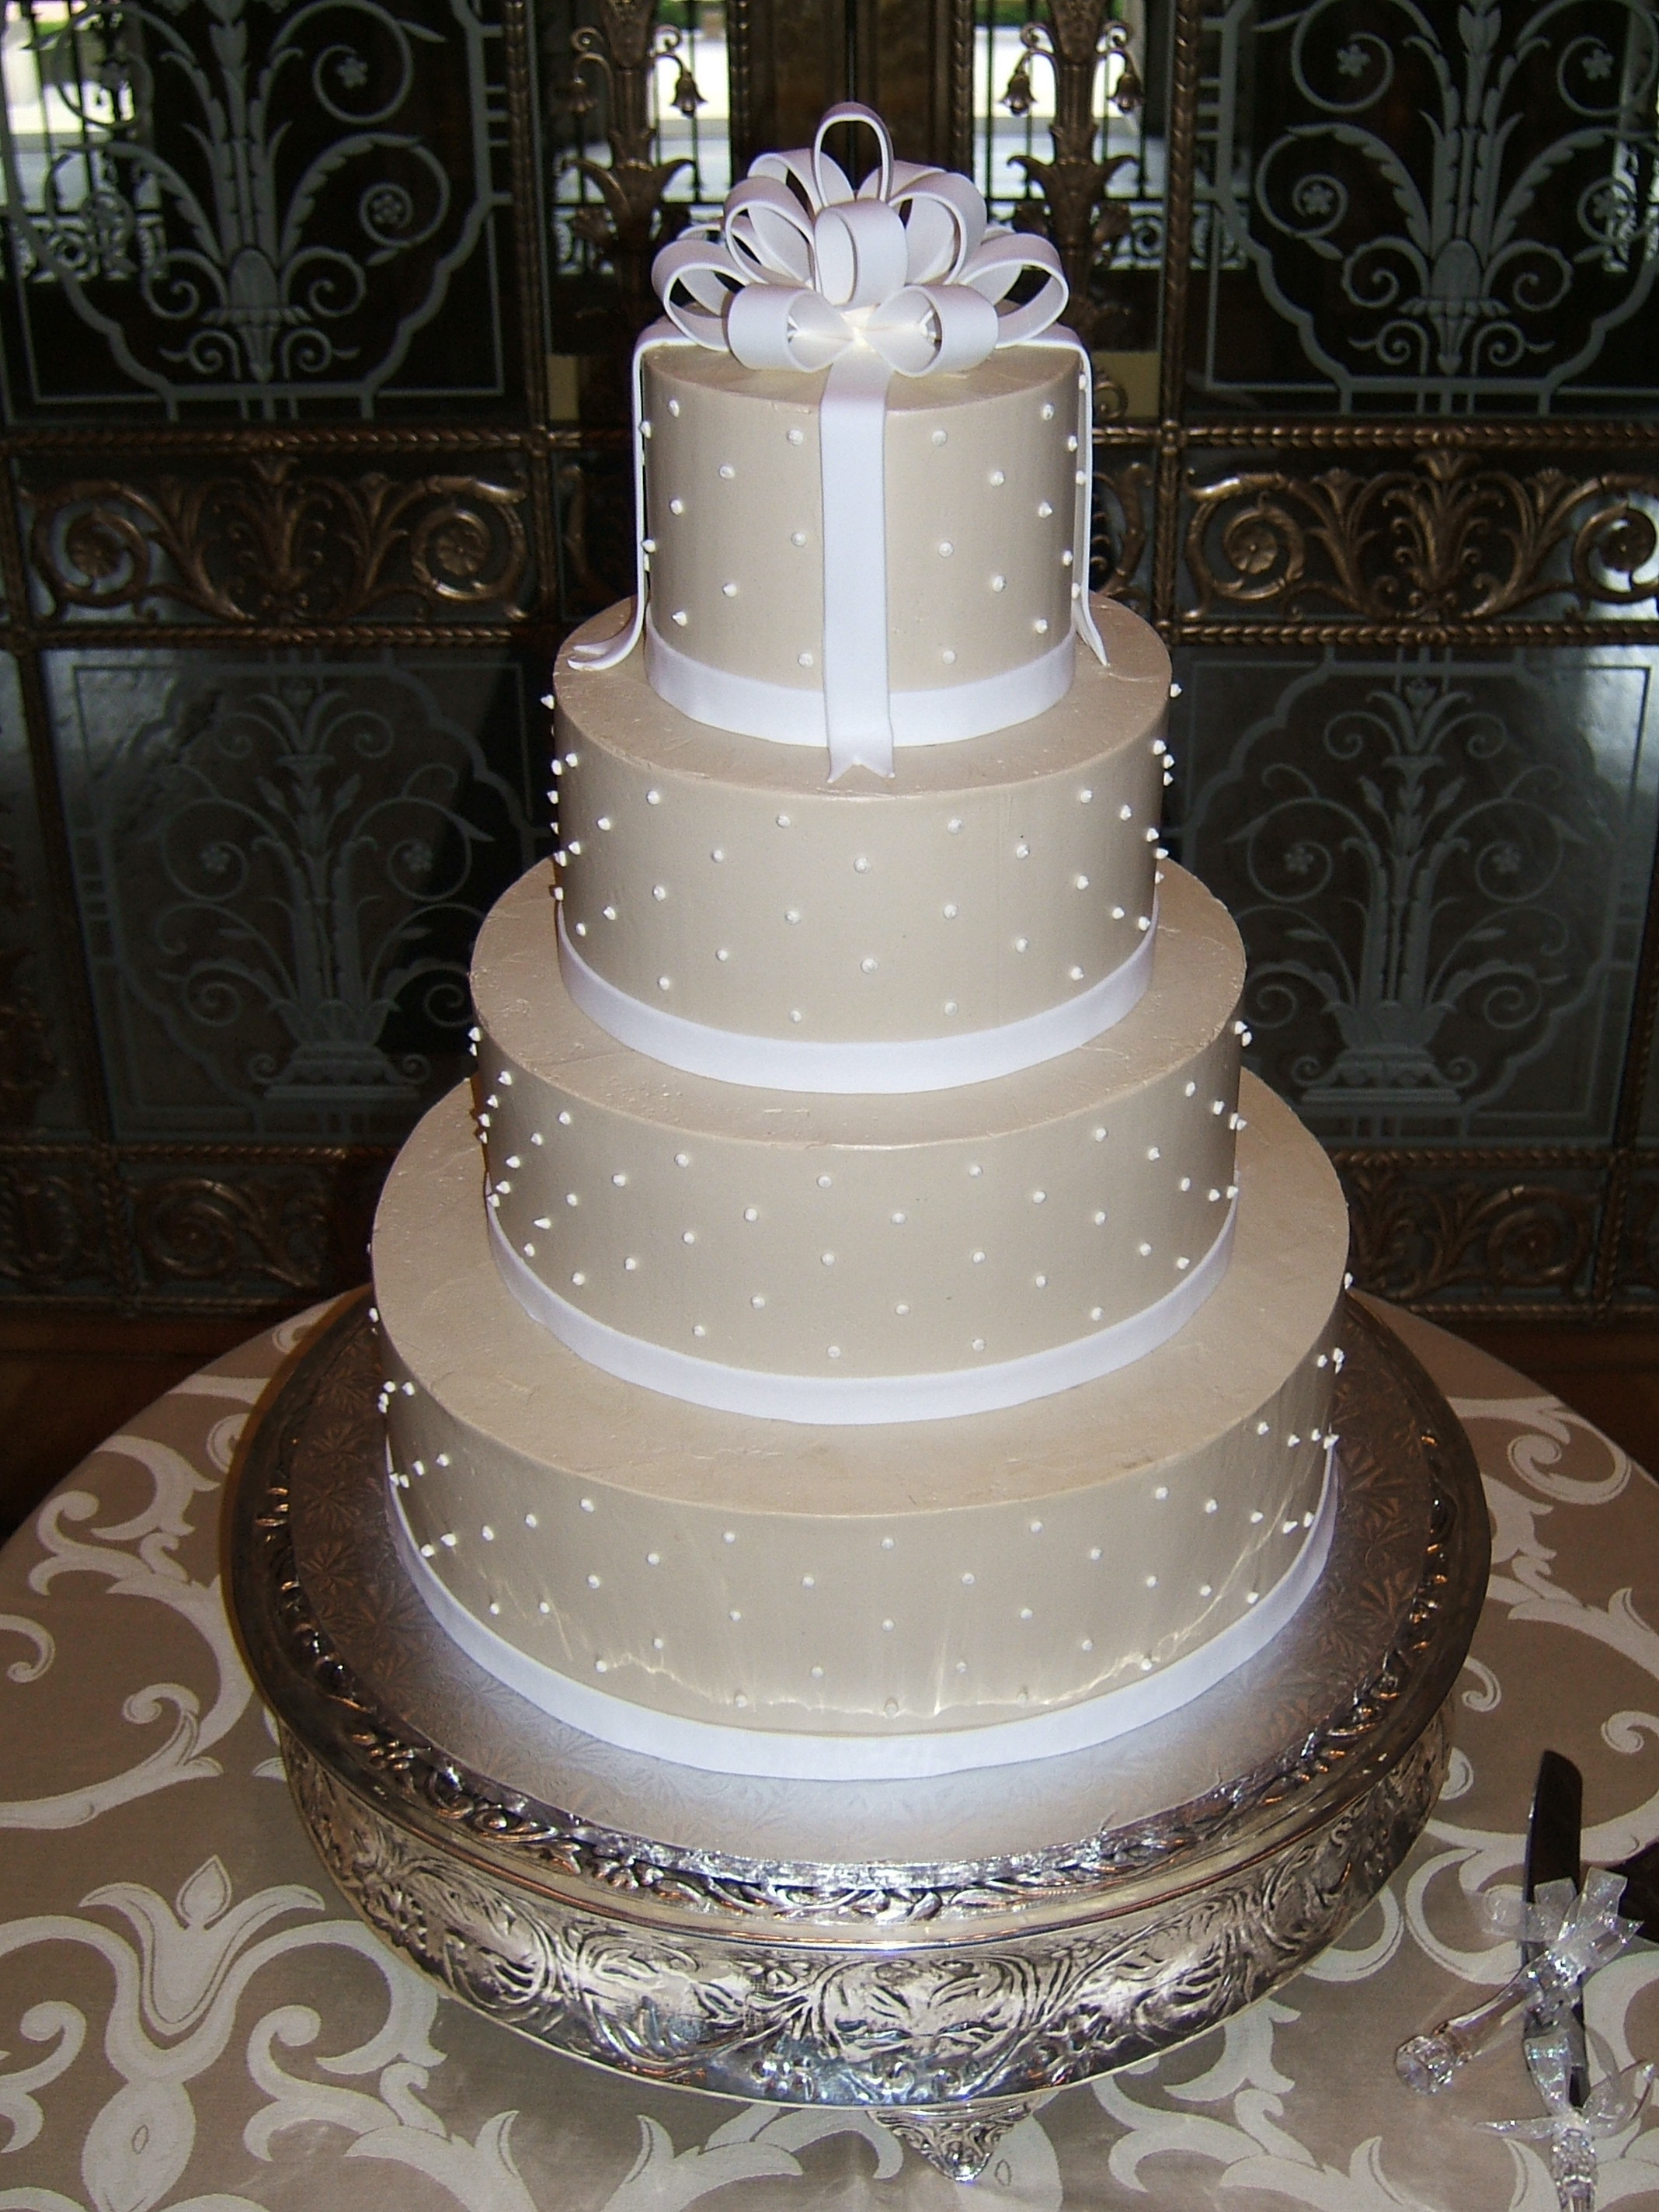 Wedding Cakes Canton Ohio the Best Ideas for Wedding Cakes Canton Ohio